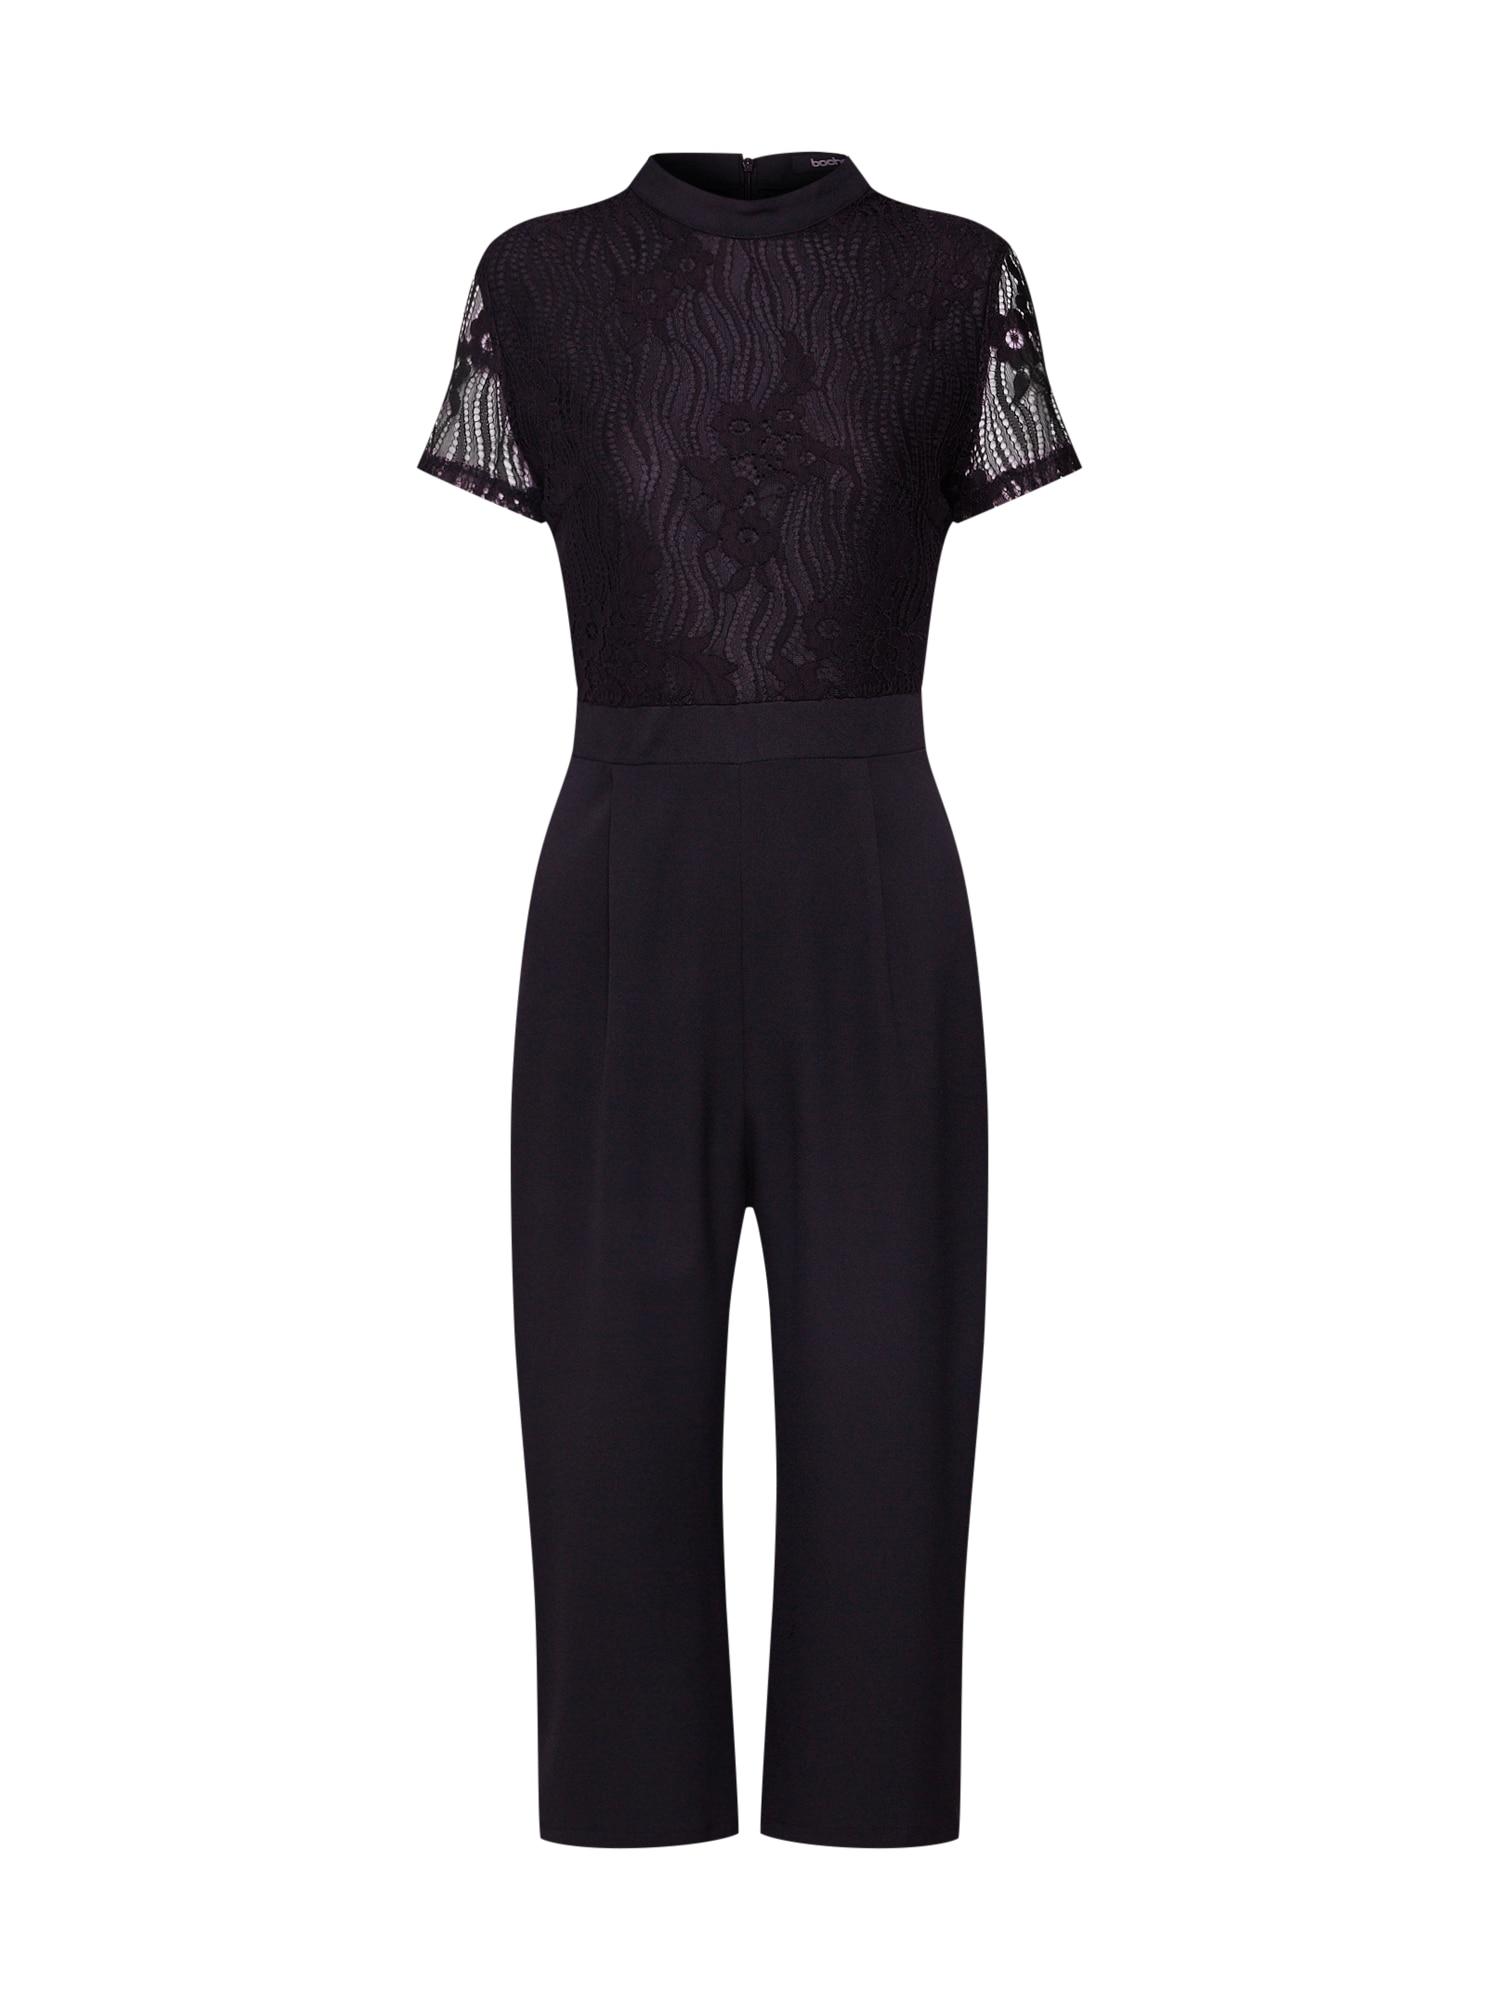 Overal High Neck Lace Cullotte Jumpsuit černá Boohoo